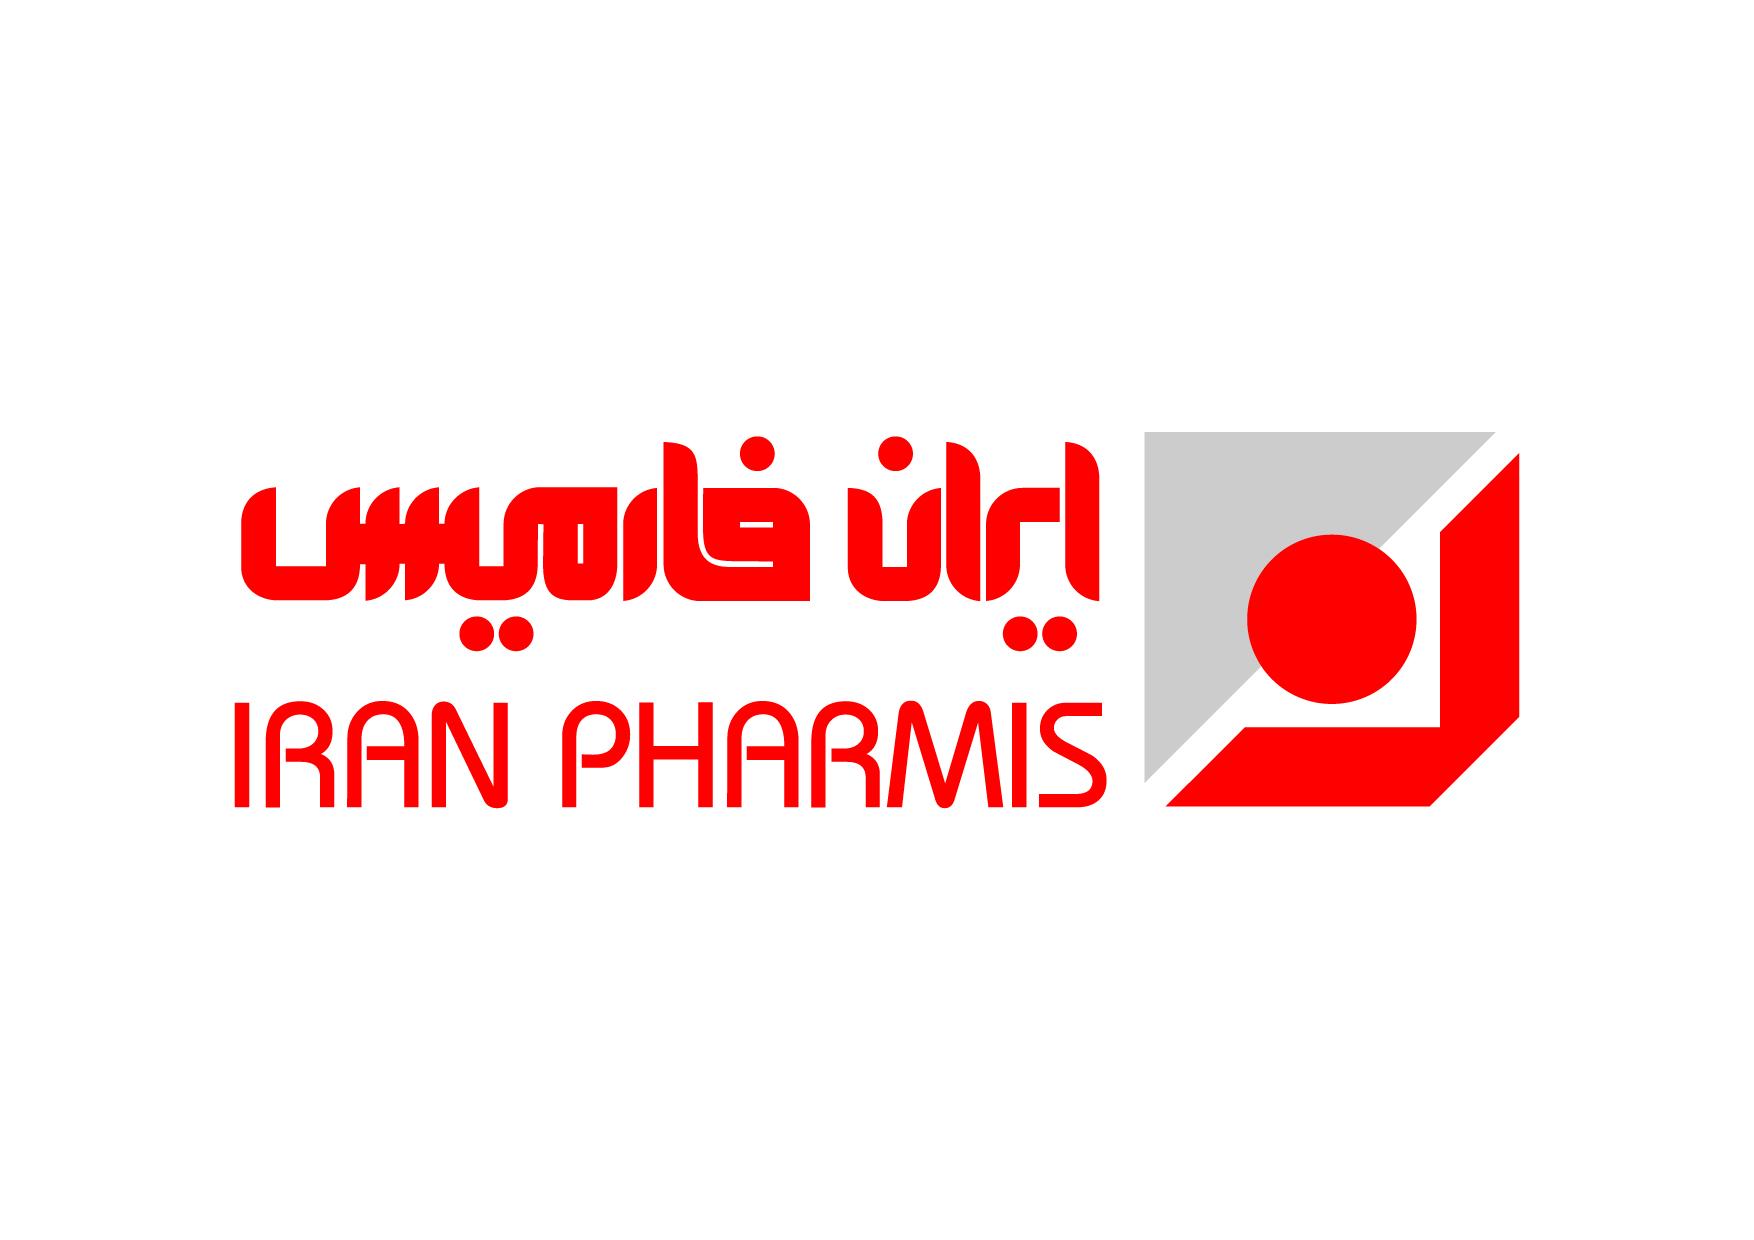 http://www.iranpharmis.org